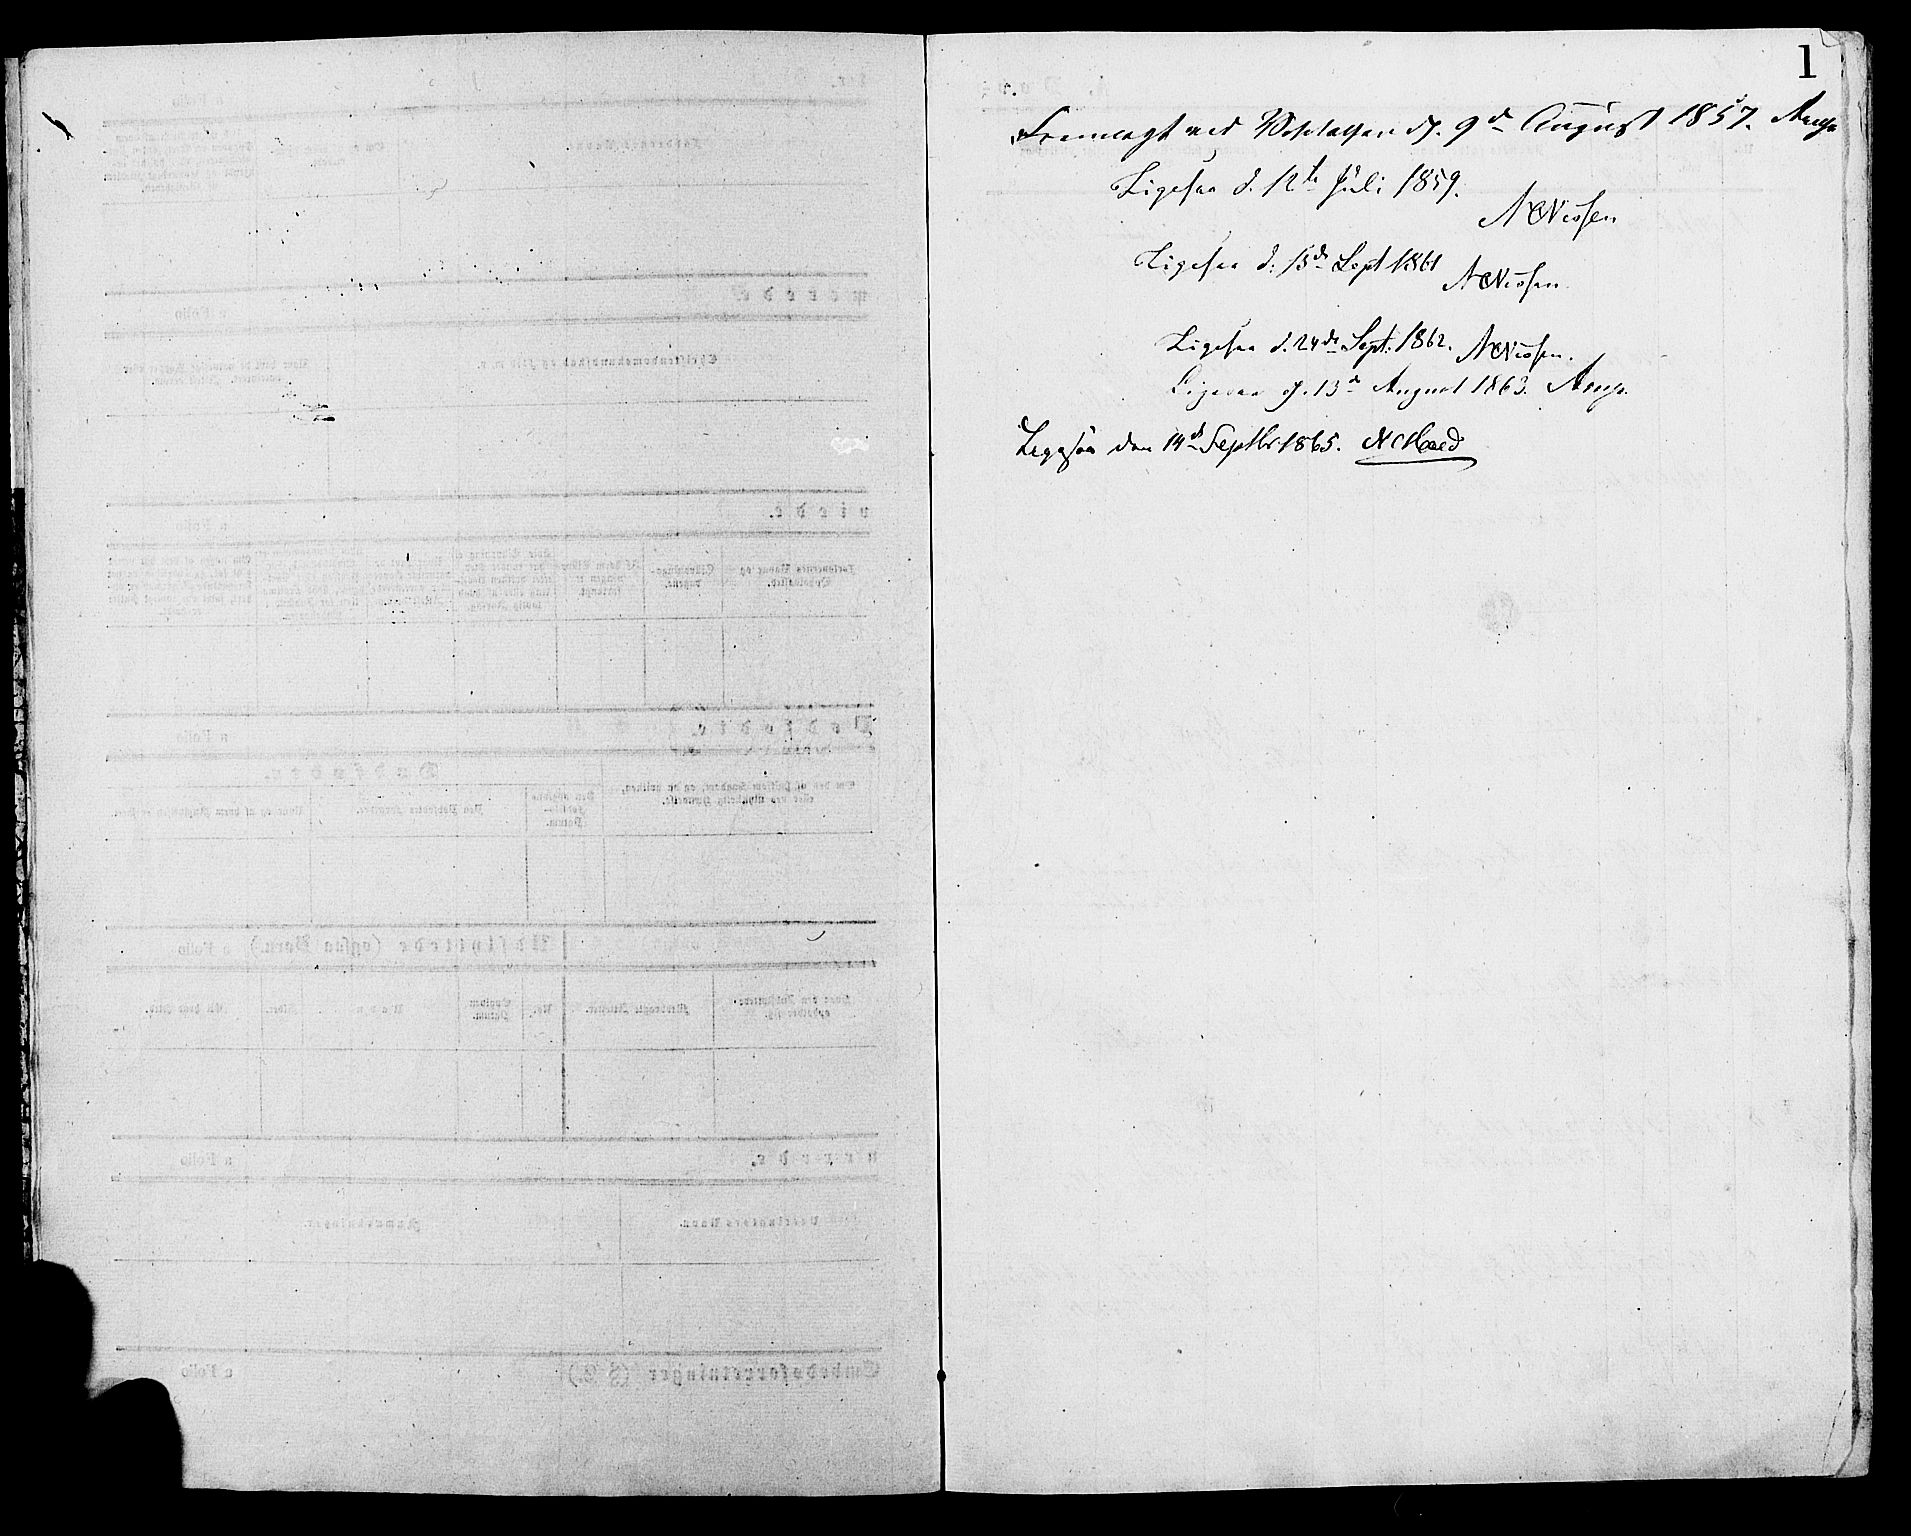 SAH, Lesja prestekontor, Ministerialbok nr. 9, 1854-1889, s. 1